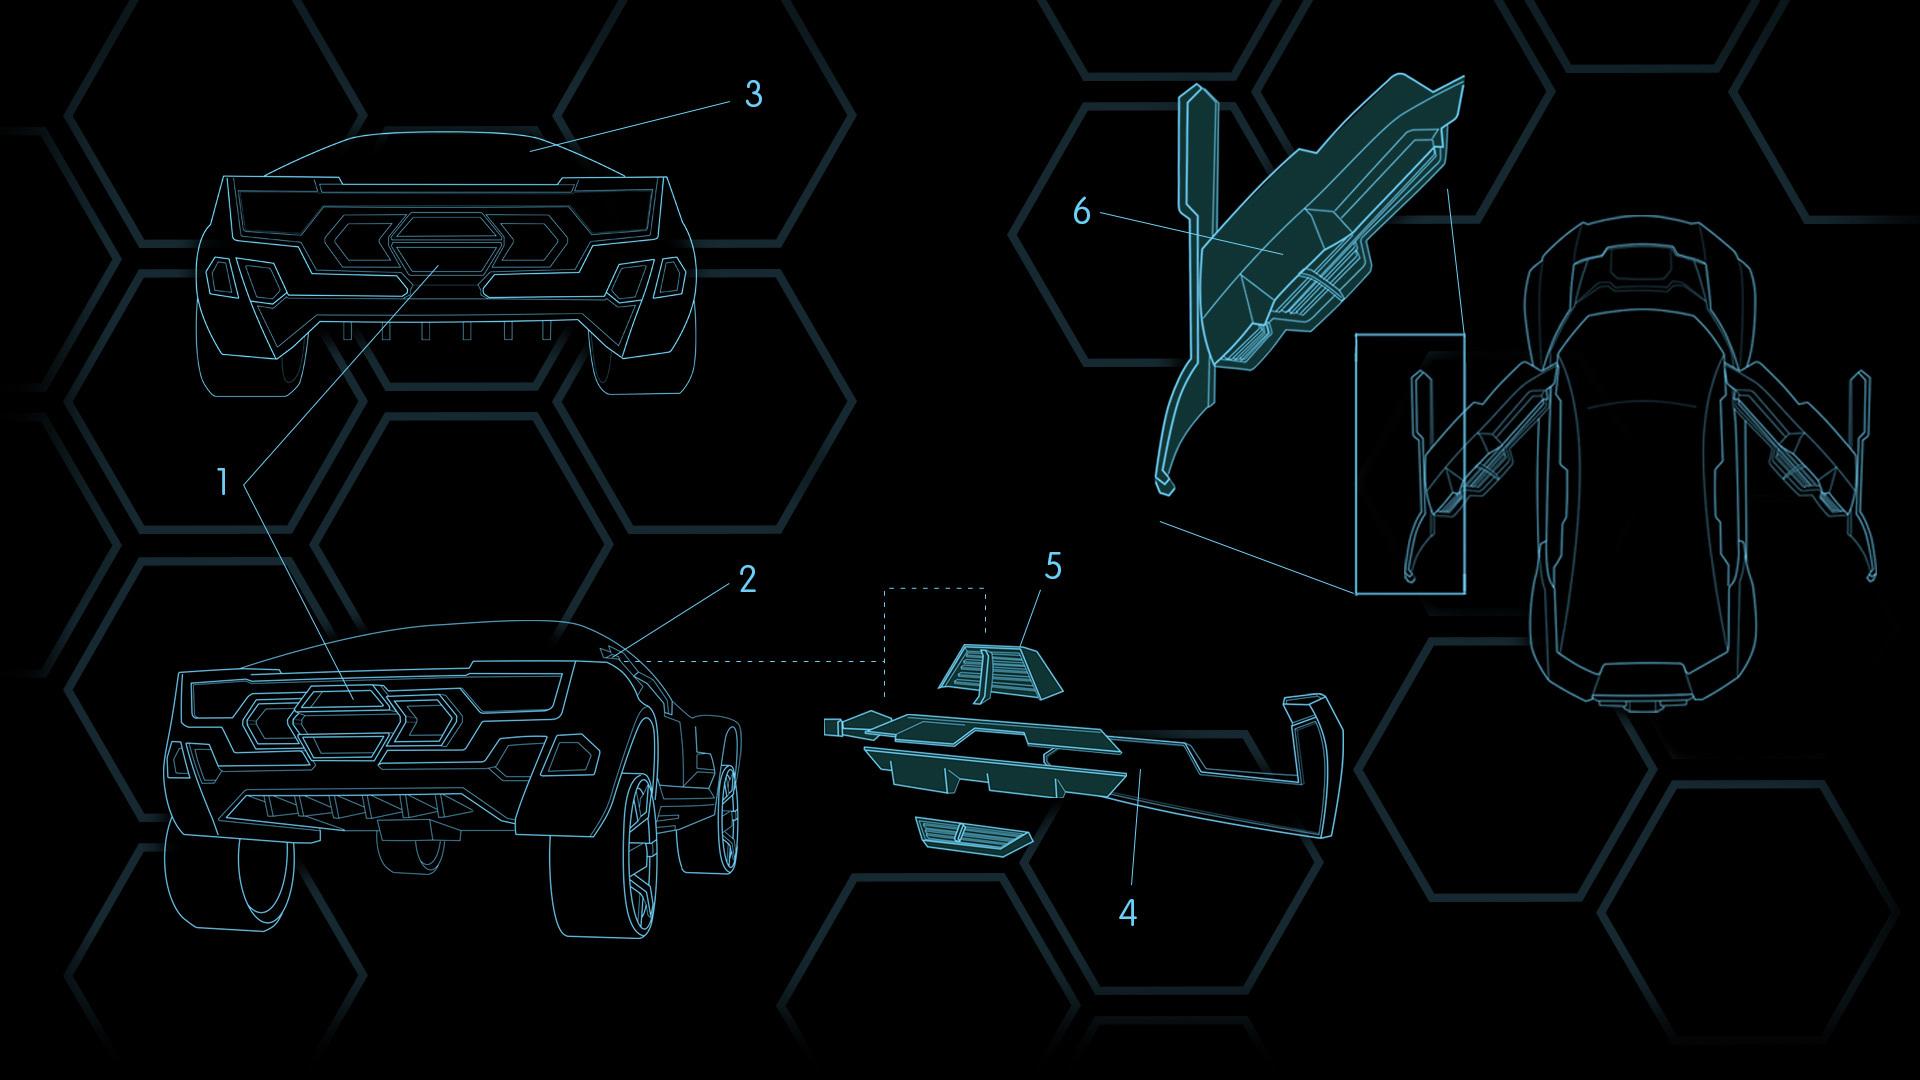 Steam Card Exchange Showcase Distance Schematic Maker Jam And Jelly Diagram Image In Spectrum Schematicscommon